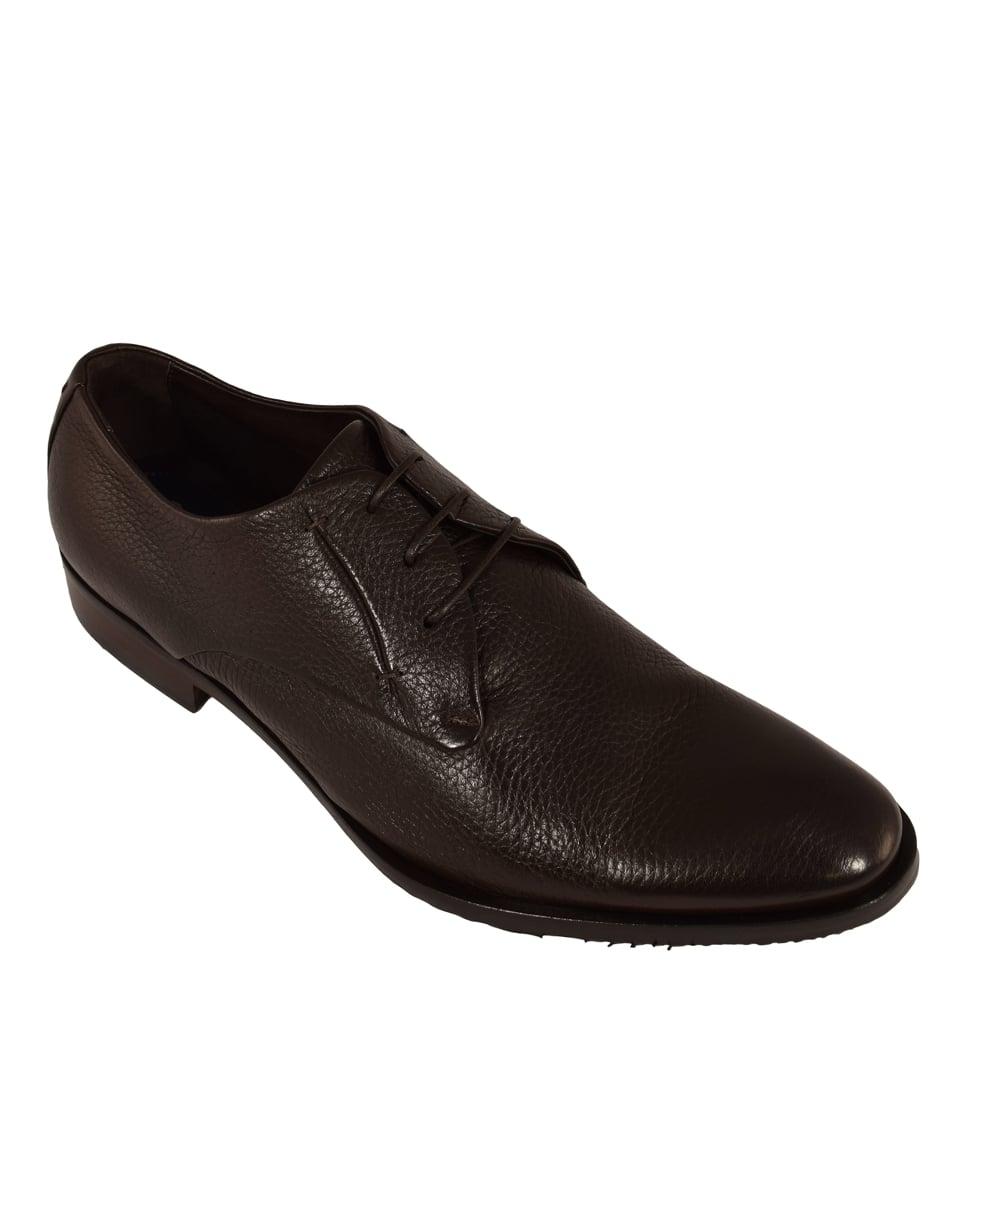 oliver sweeney leather ravelli formal derby shoe in